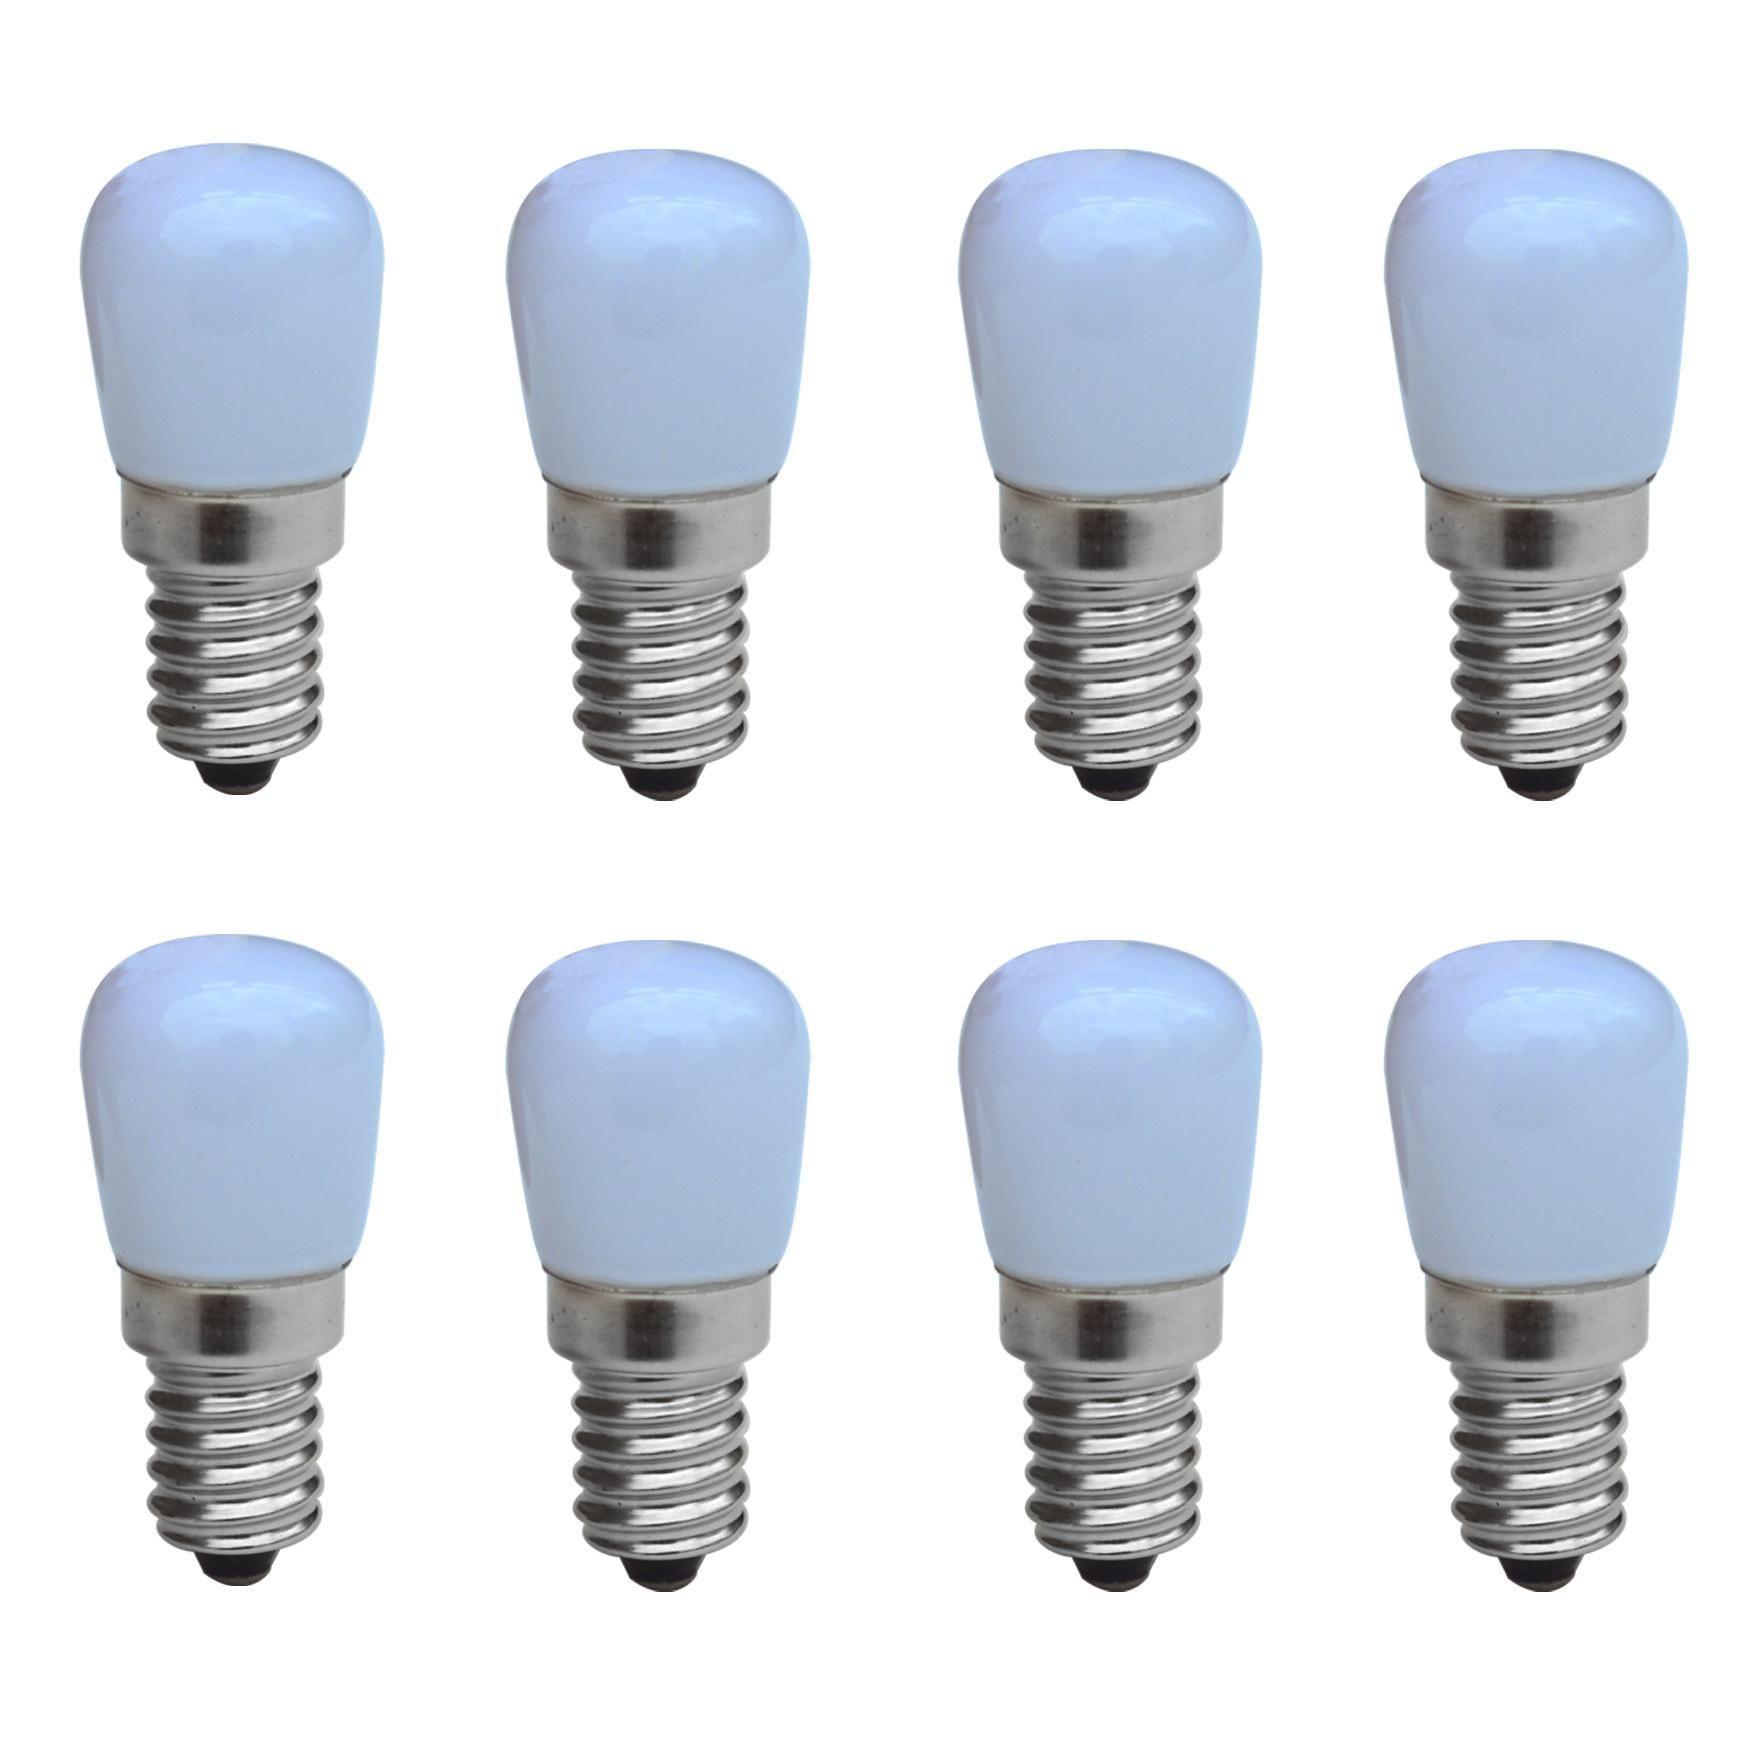 Jiawen 8pcs Lot Refrigerator Led Light Mini Bulb 220v Bright Lamp For Fridge Us 12 60 Bright Lamp Crystal Chandelier Lighting Led Lights